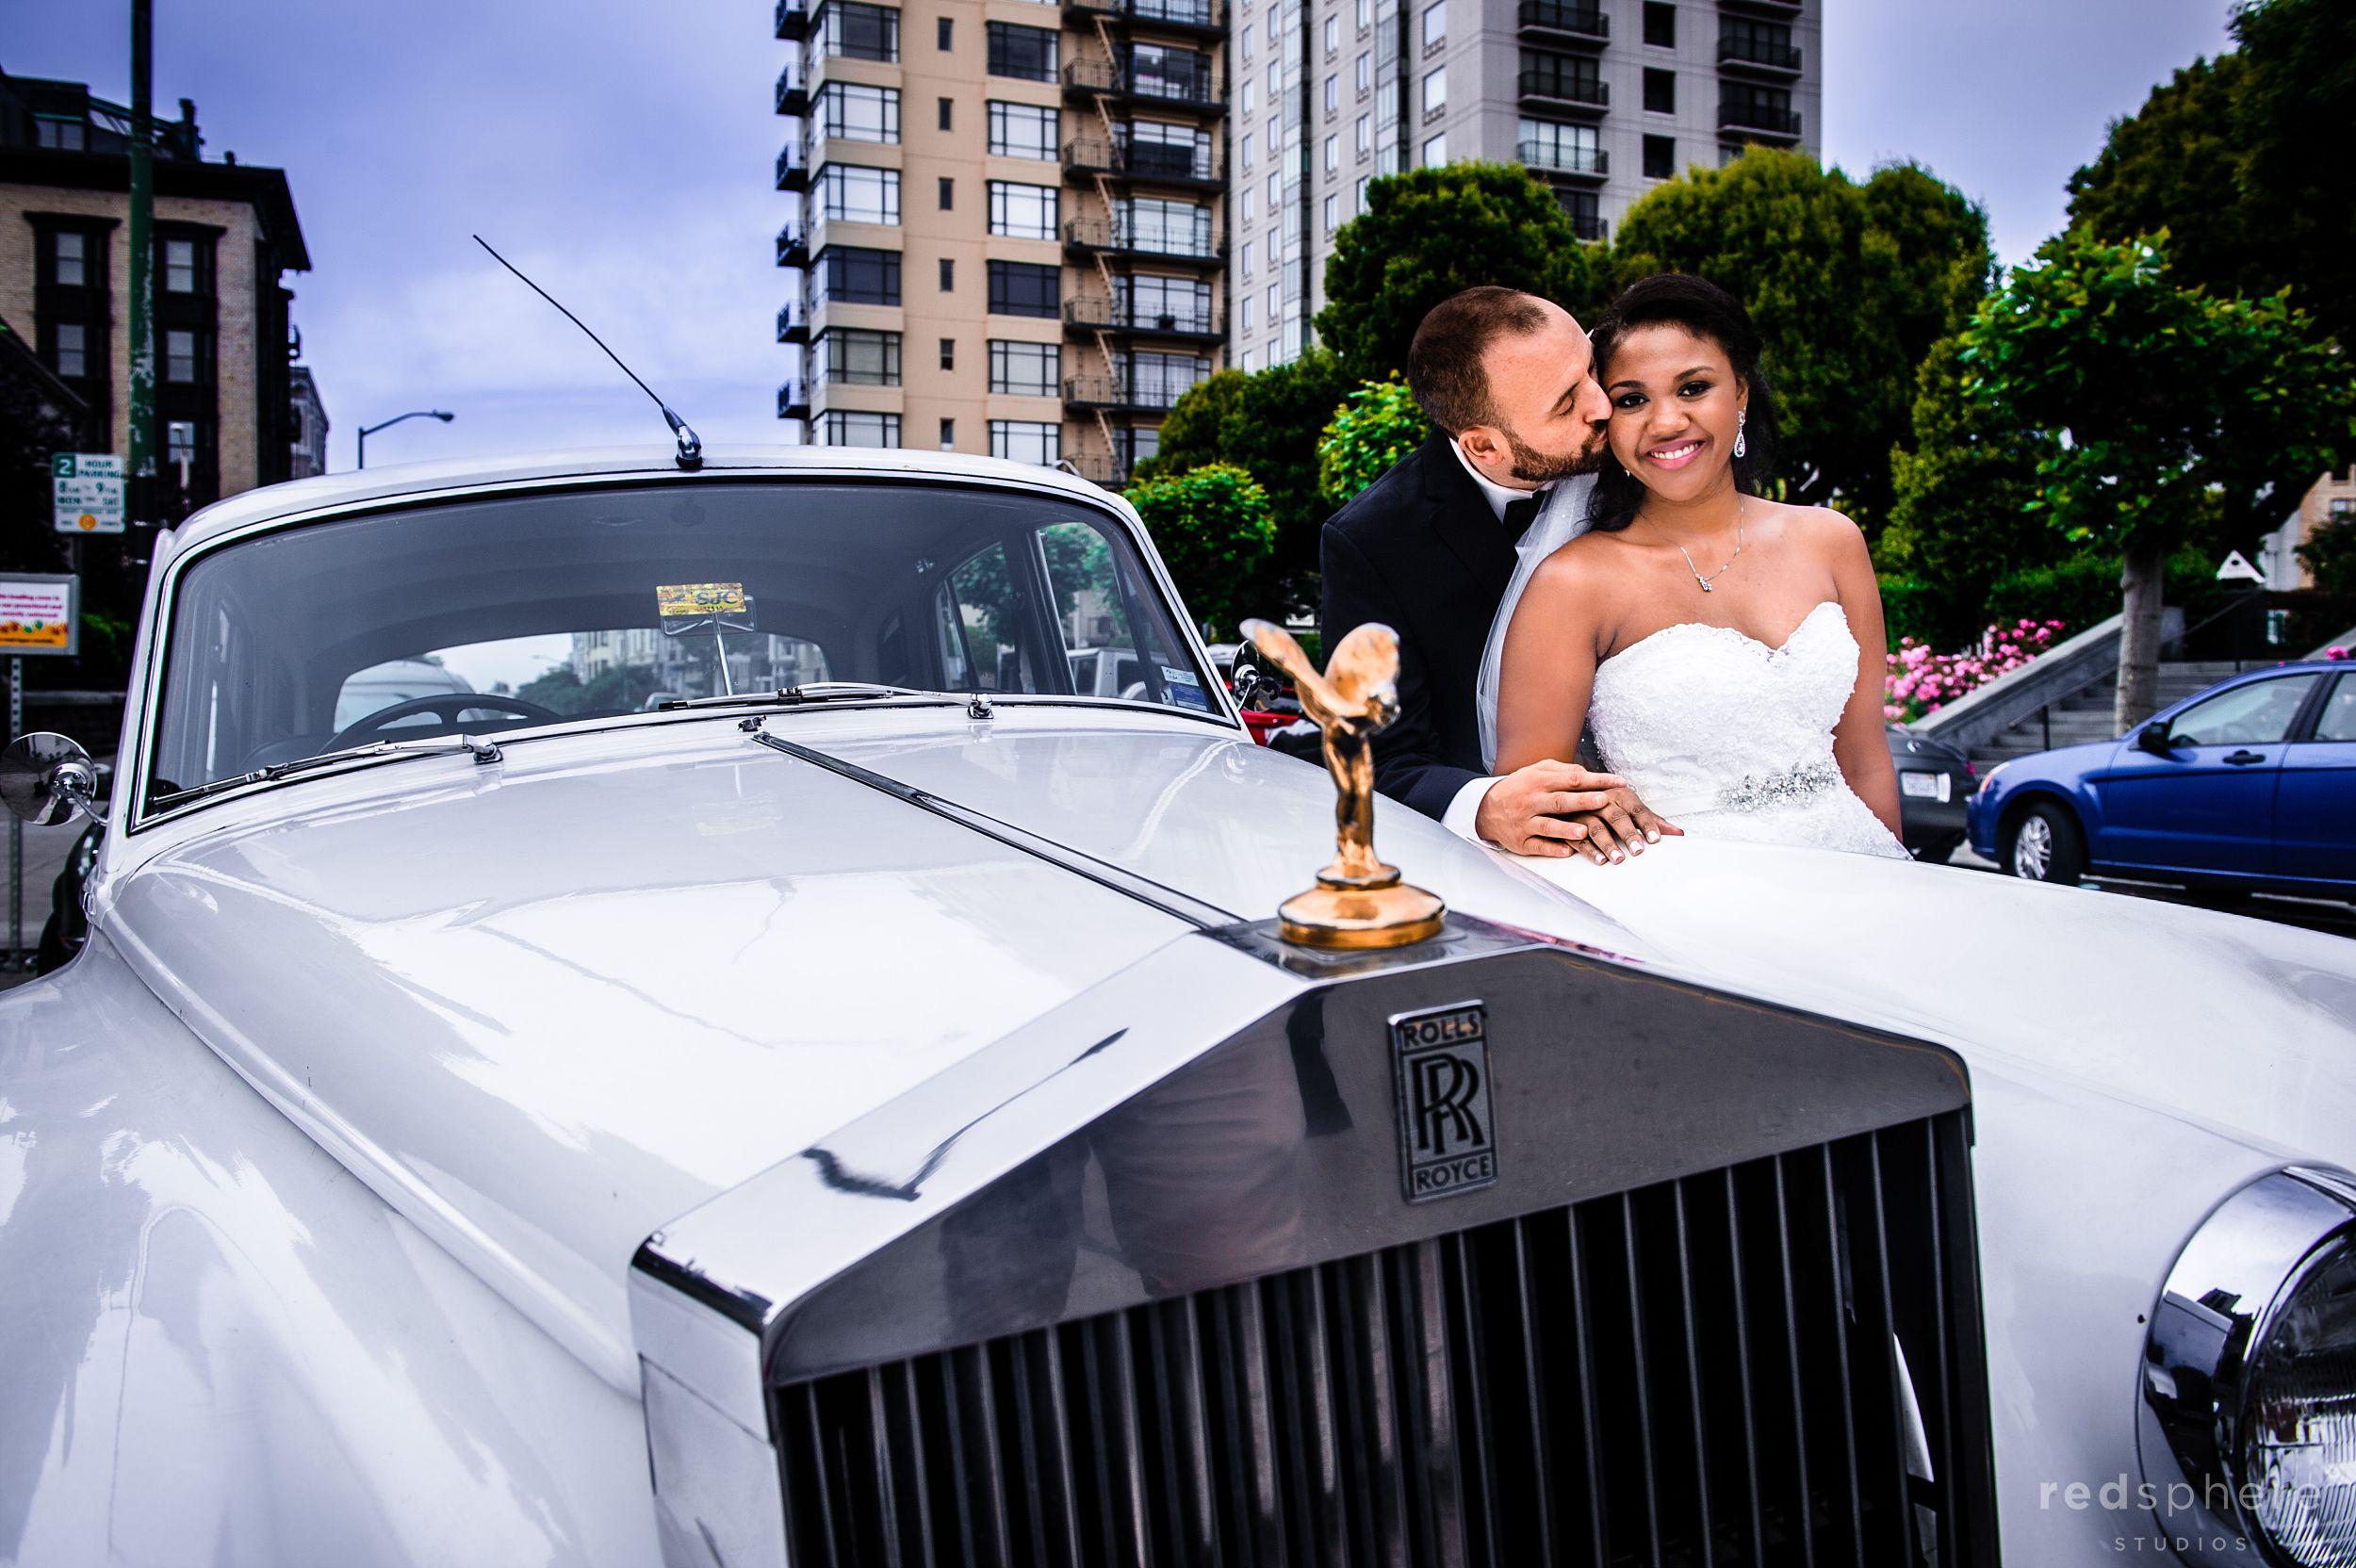 Groom Kisses Bride Next to White Vintage Car, Nob Hill San Francisco